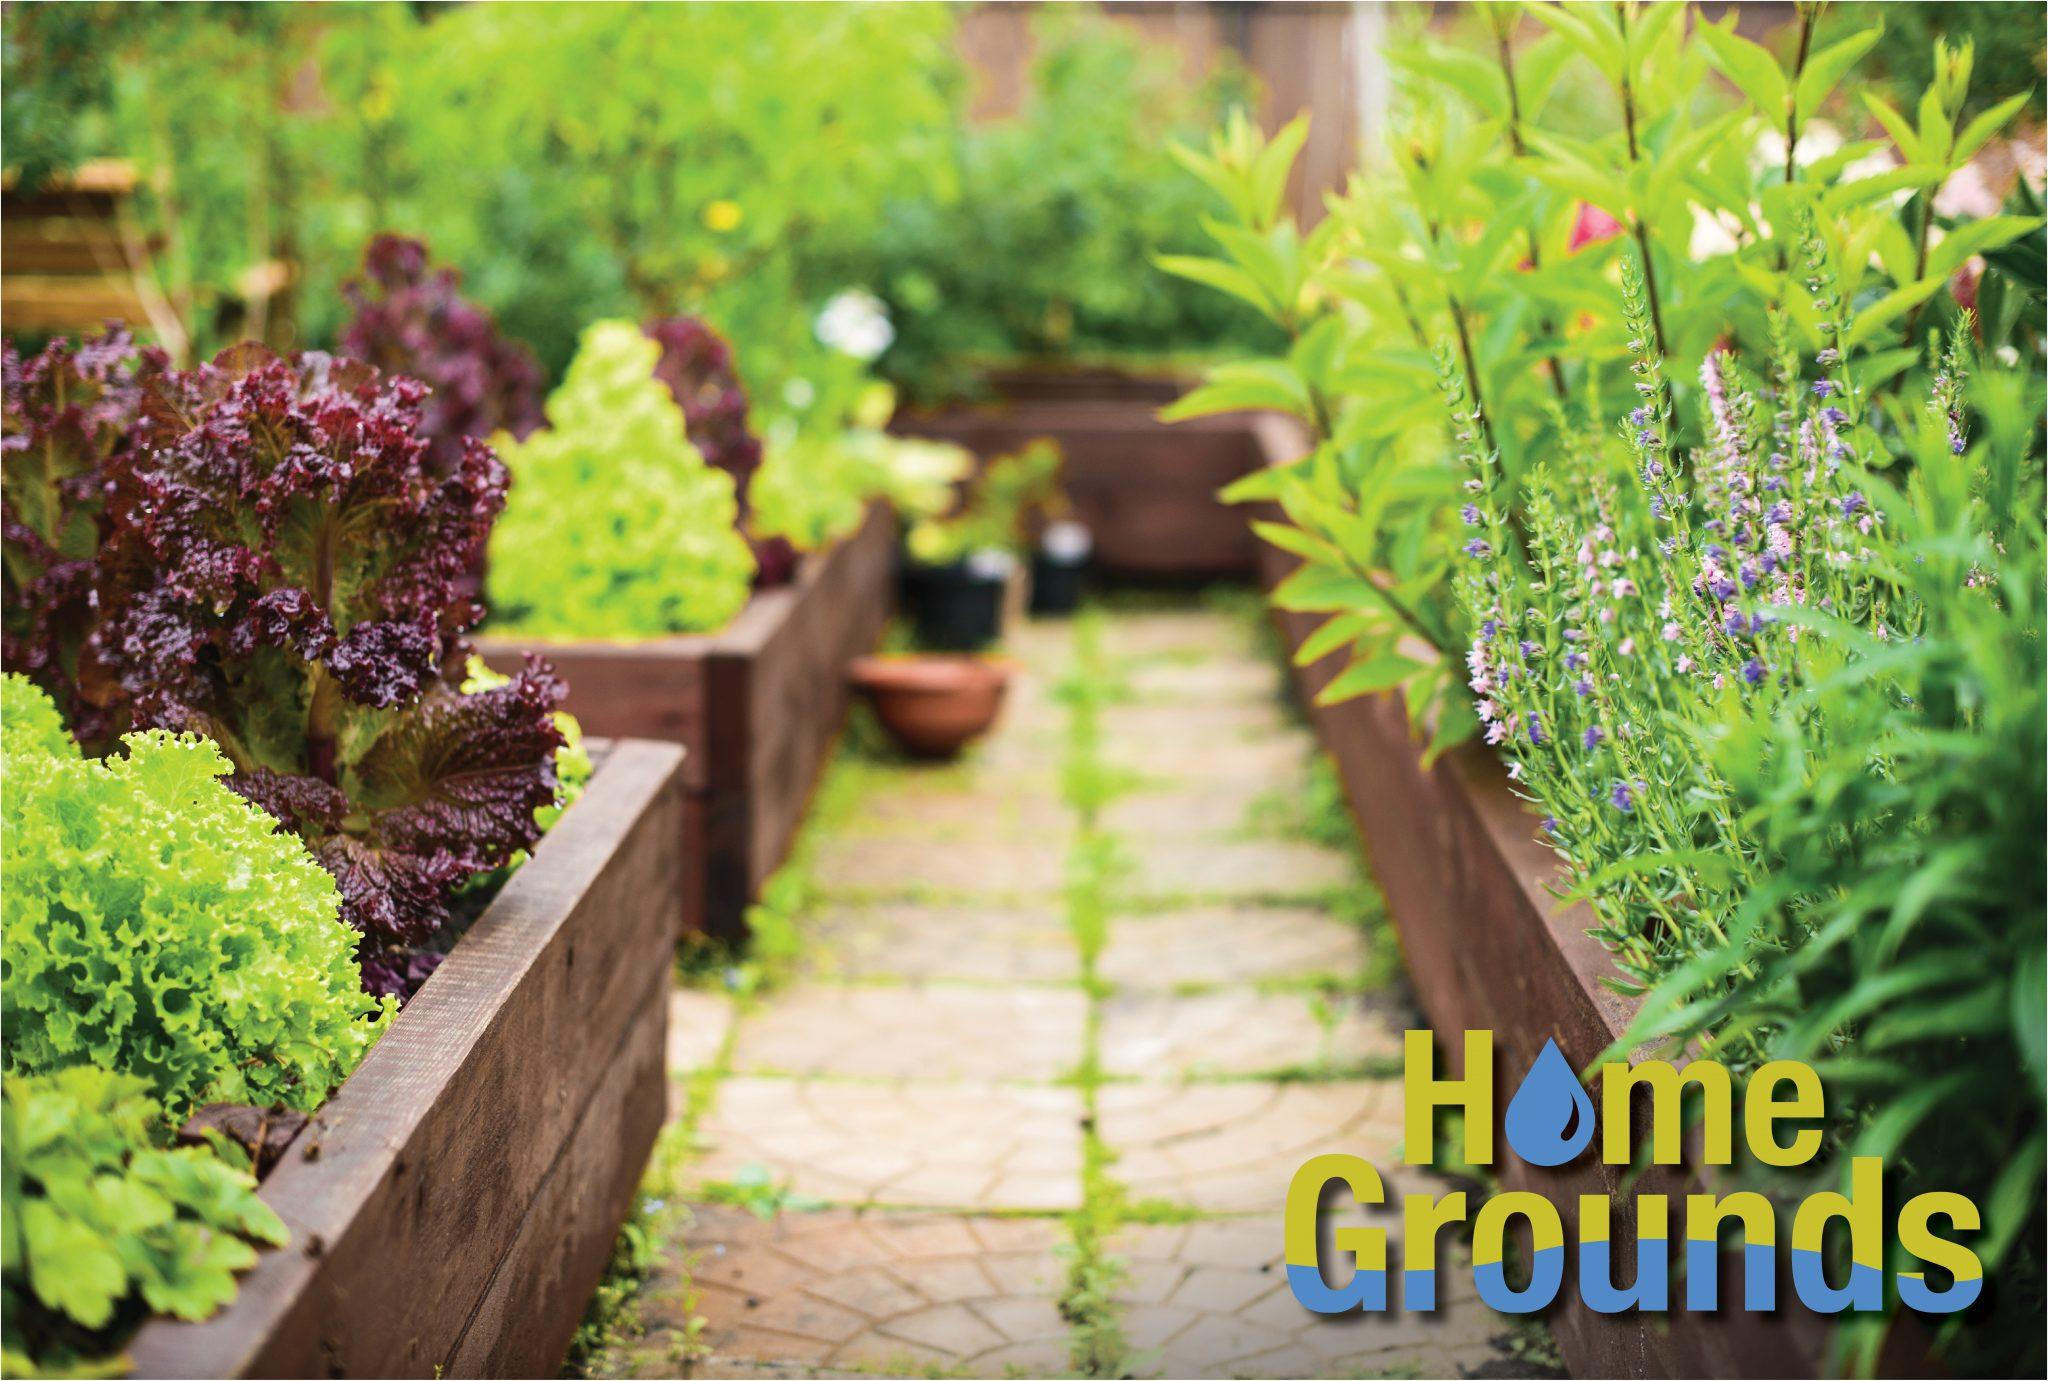 Raised-bed vegetable garden